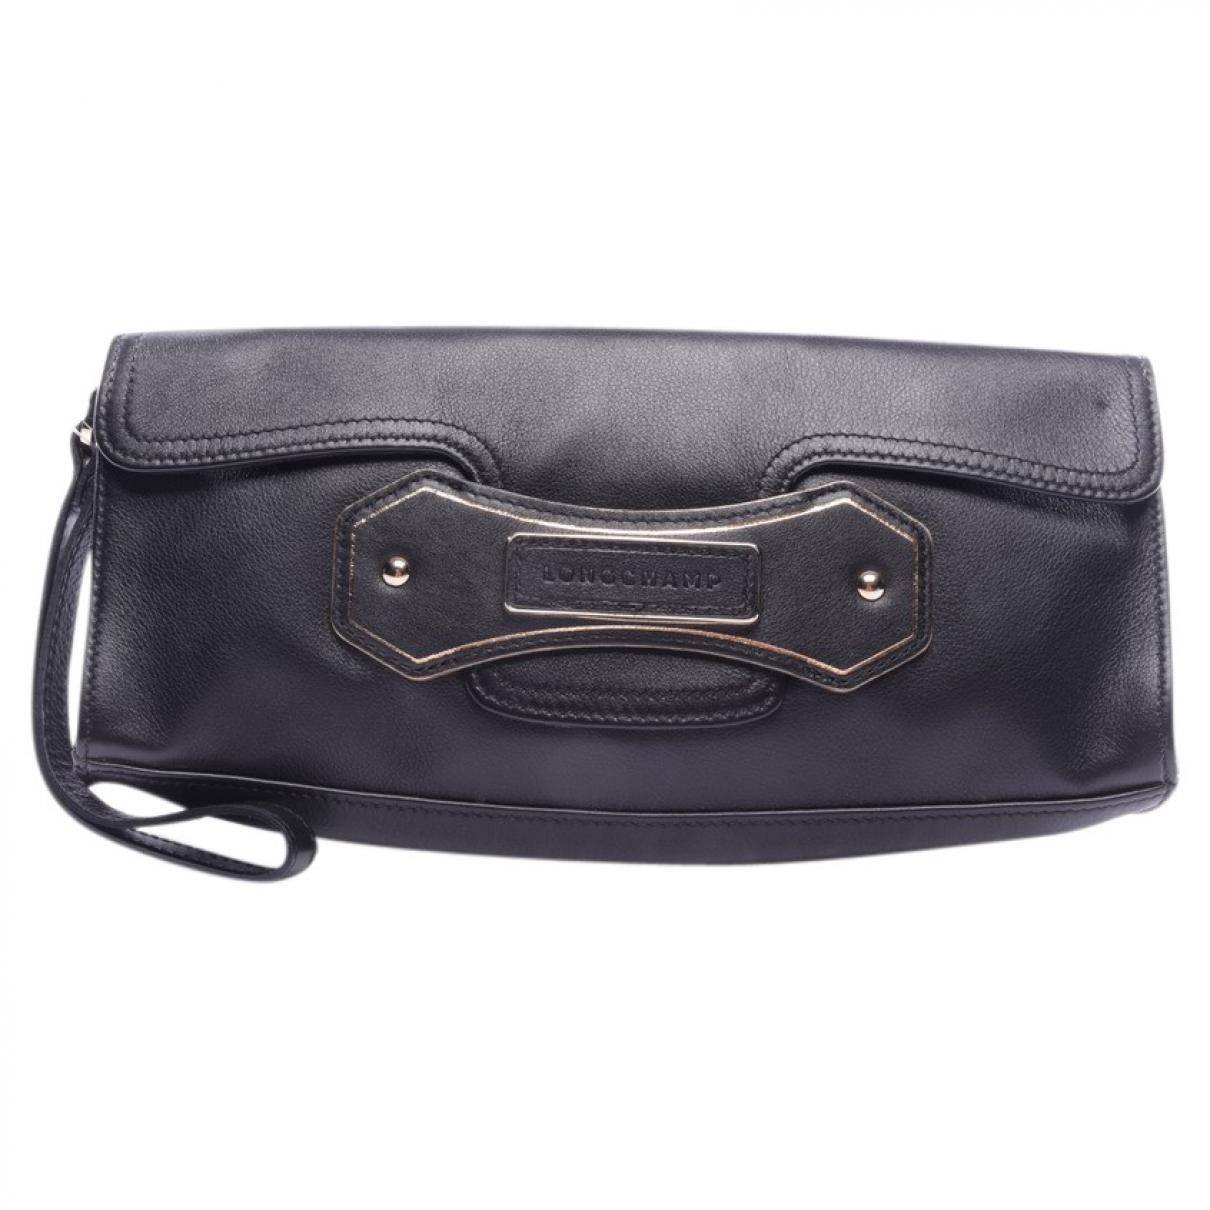 Longchamp N Black Leather Clutch bag for Women N